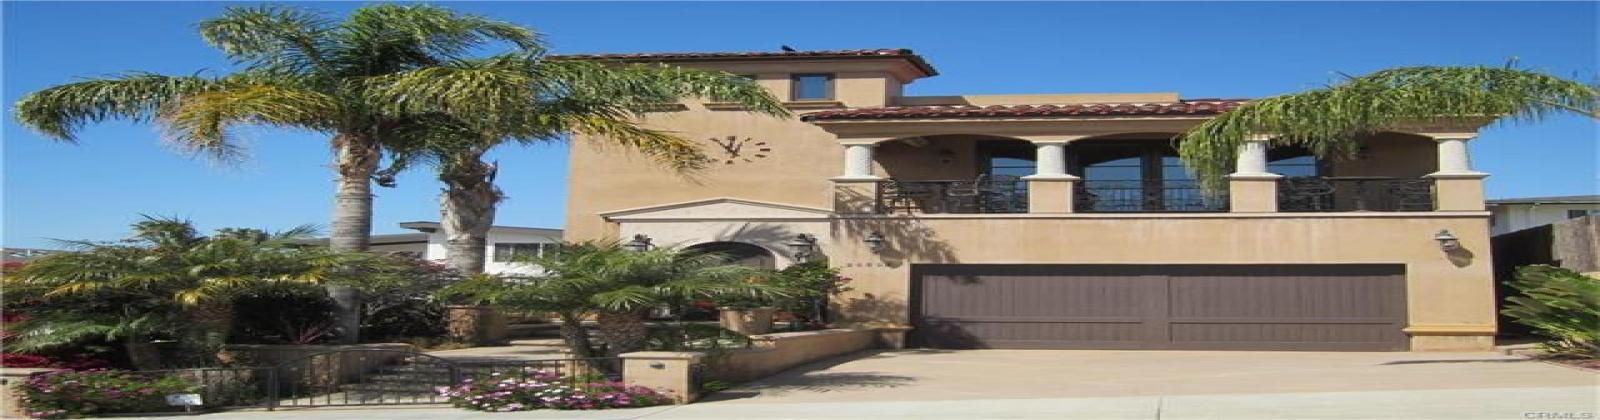 26509 Via Sacramento, Dana Point, California 92624, 4 Bedrooms Bedrooms, ,5 BathroomsBathrooms,Home,Sold,Via Sacramento,1010